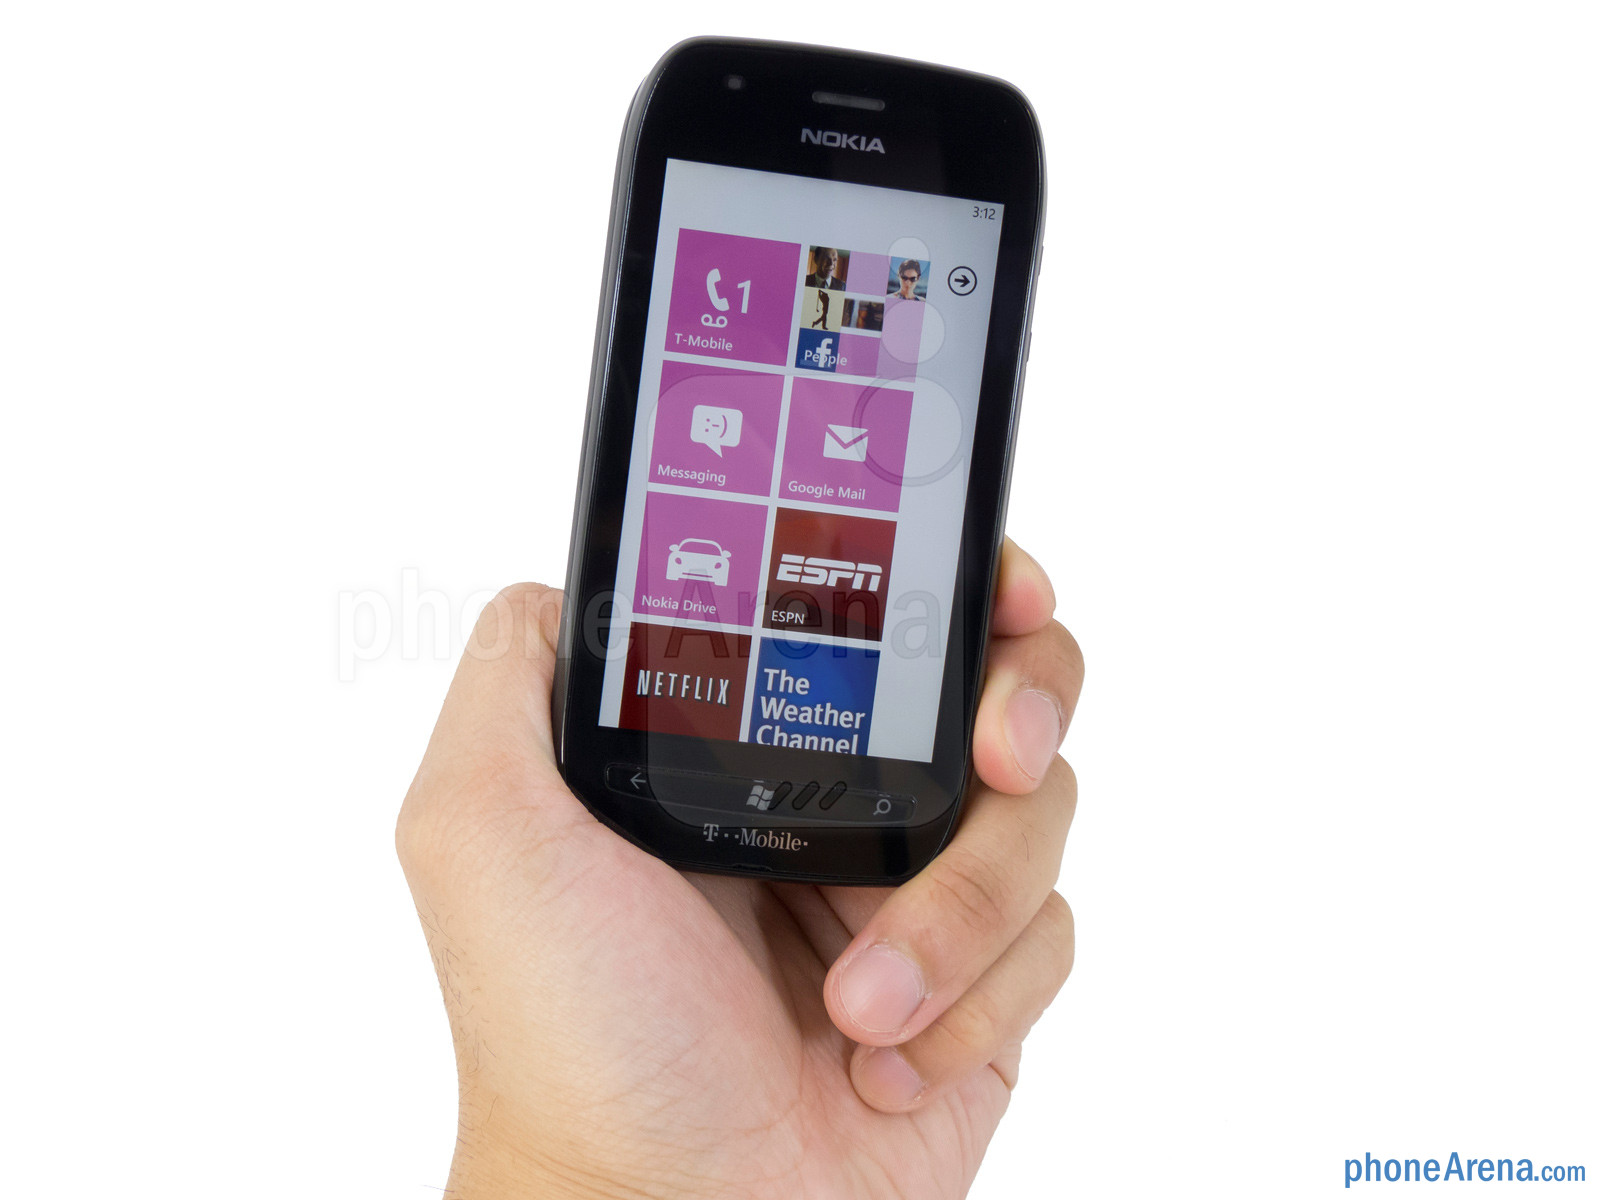 http://1.bp.blogspot.com/-ExT5hzeuJN8/T5CAhej1I1I/AAAAAAAADHM/K0adHLaCXM0/s1600/Nokia-Lumia-710-Review-Design-03.jpg